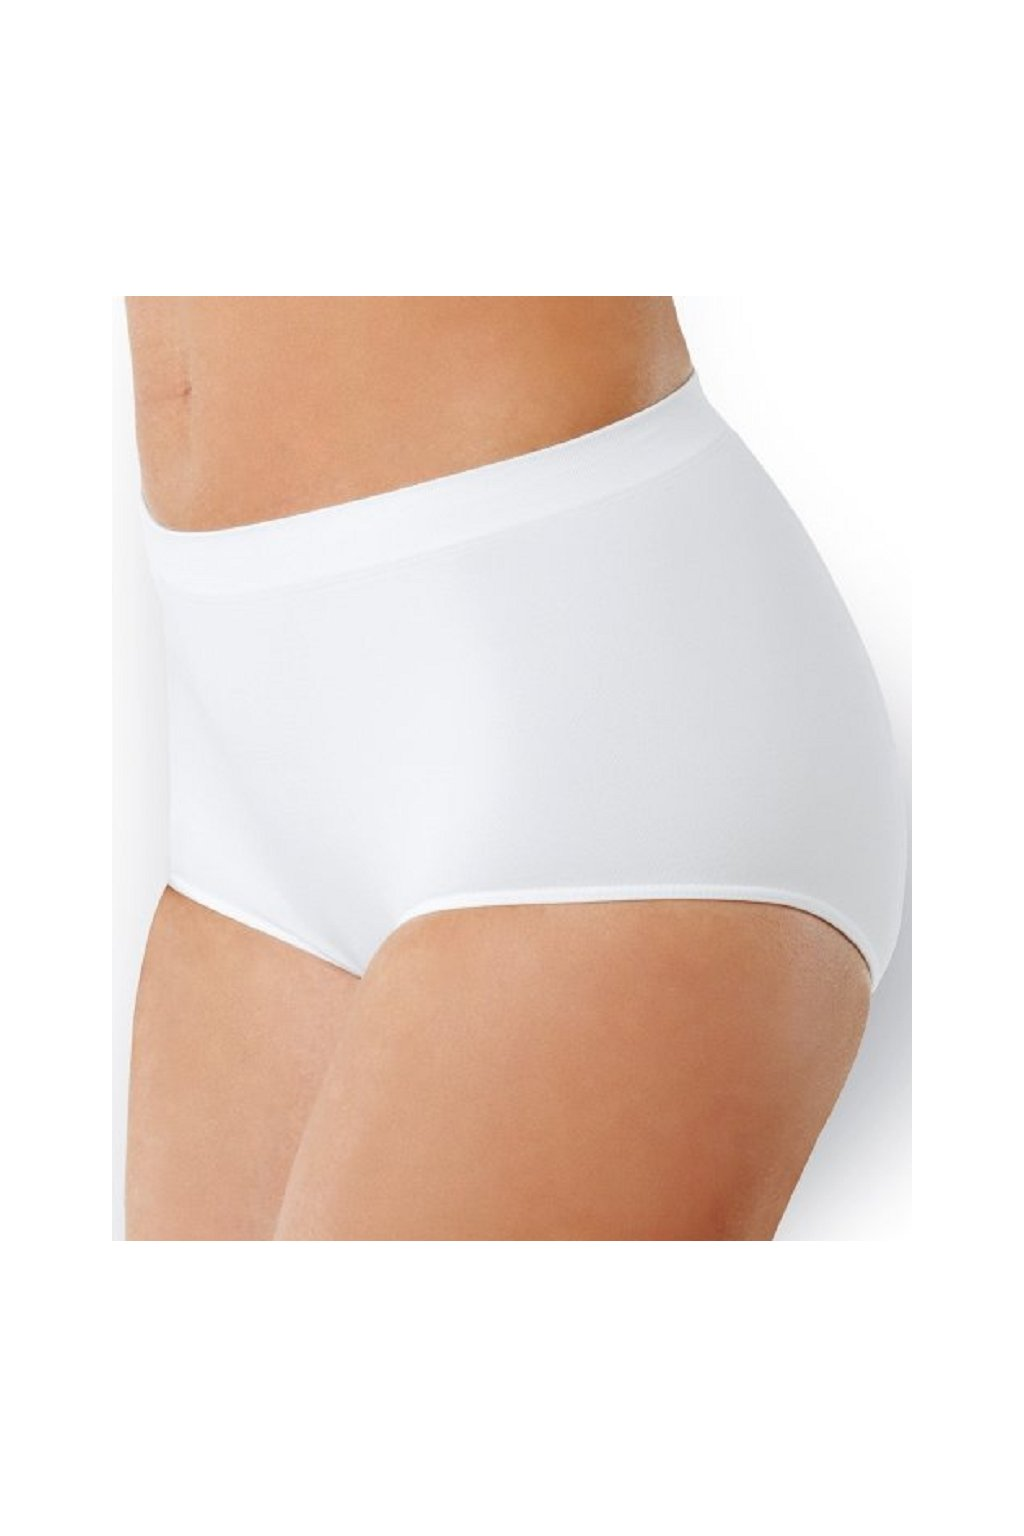 Dámské kalhotky Intimidea Slip culotte 310115 bílá